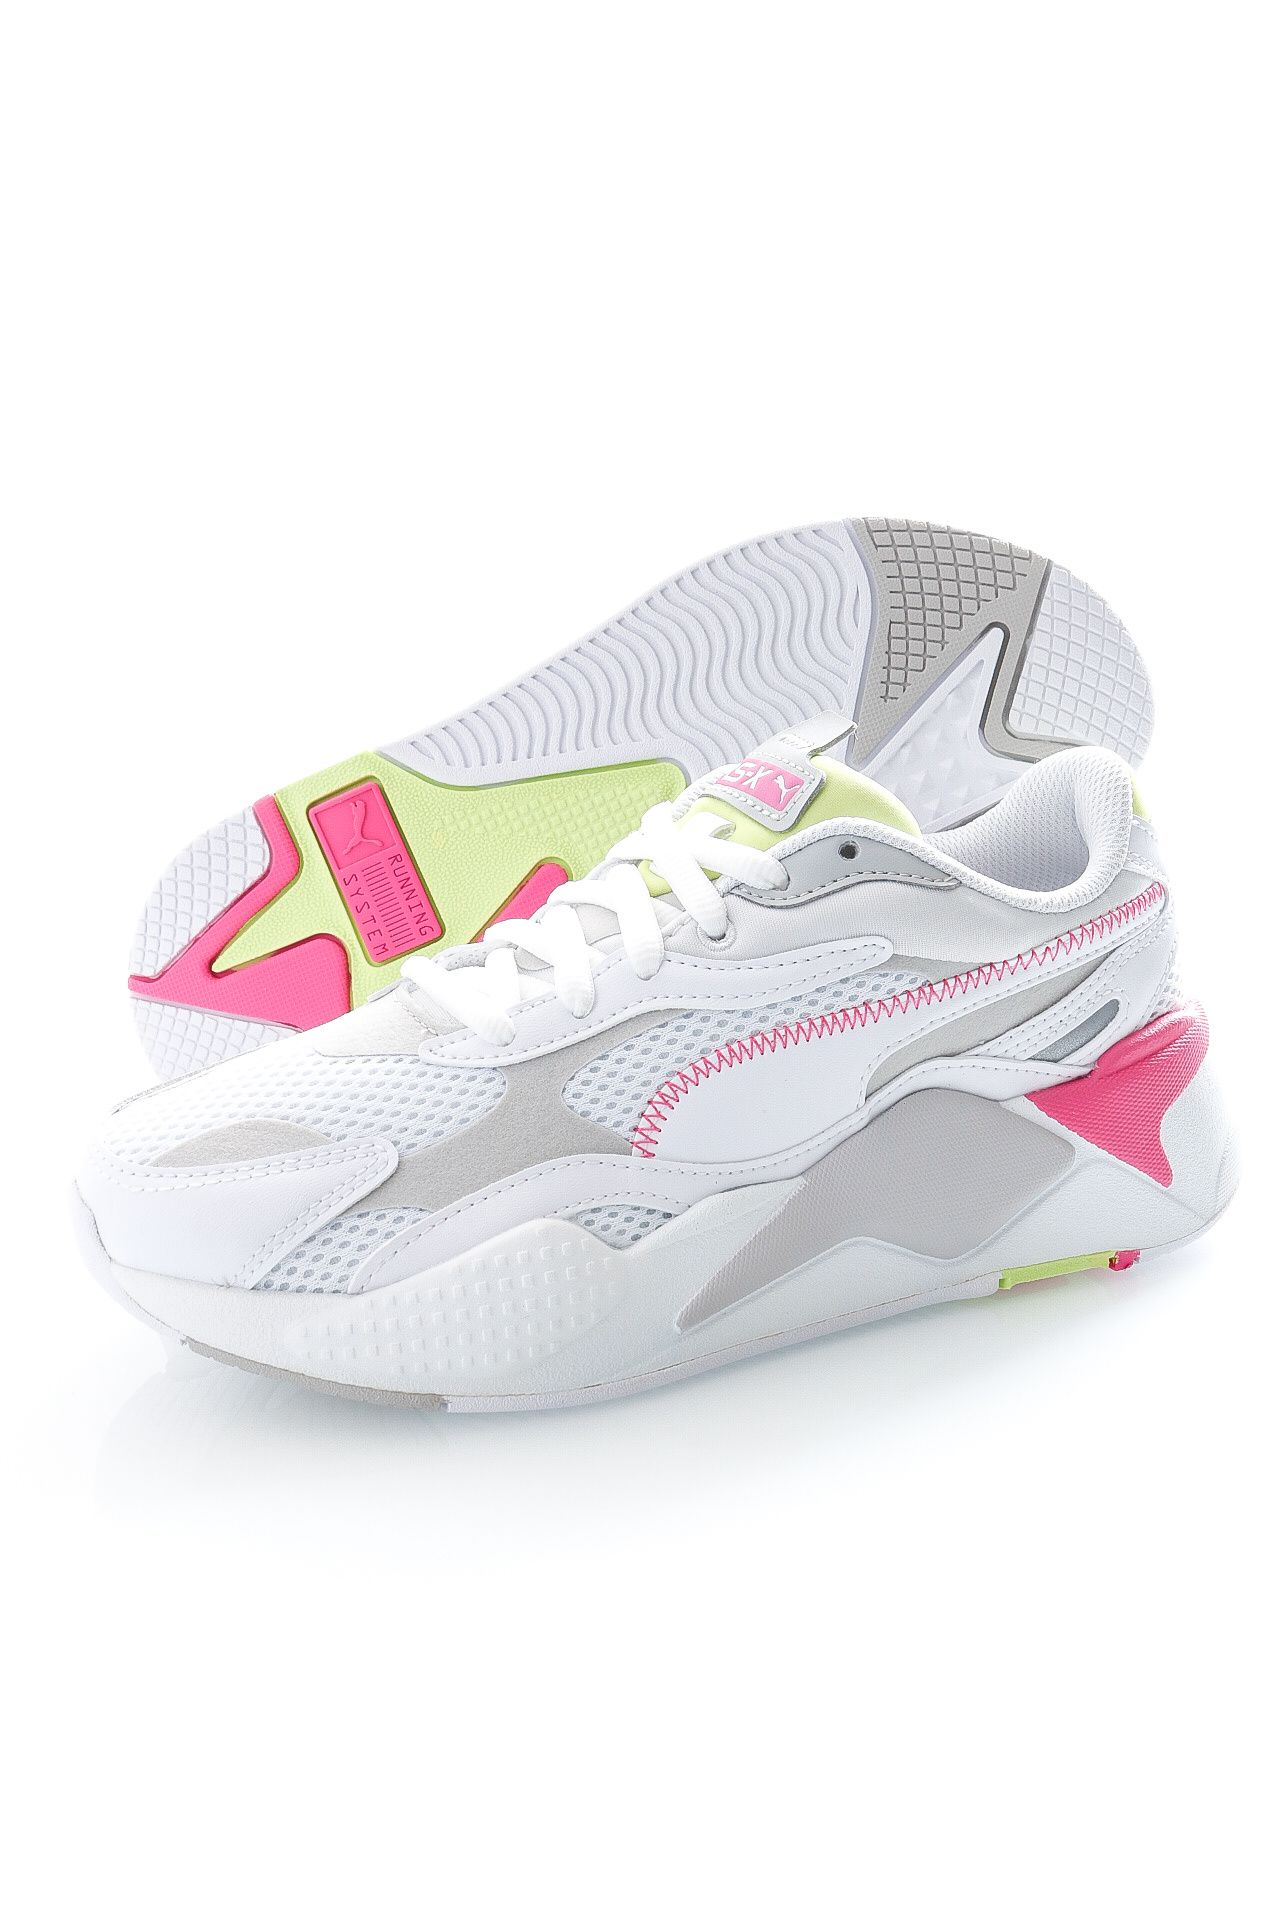 Afbeelding van Puma Sneakers RS-X³ Millenium Puma White-Gray Violet-Sharp Green 37323